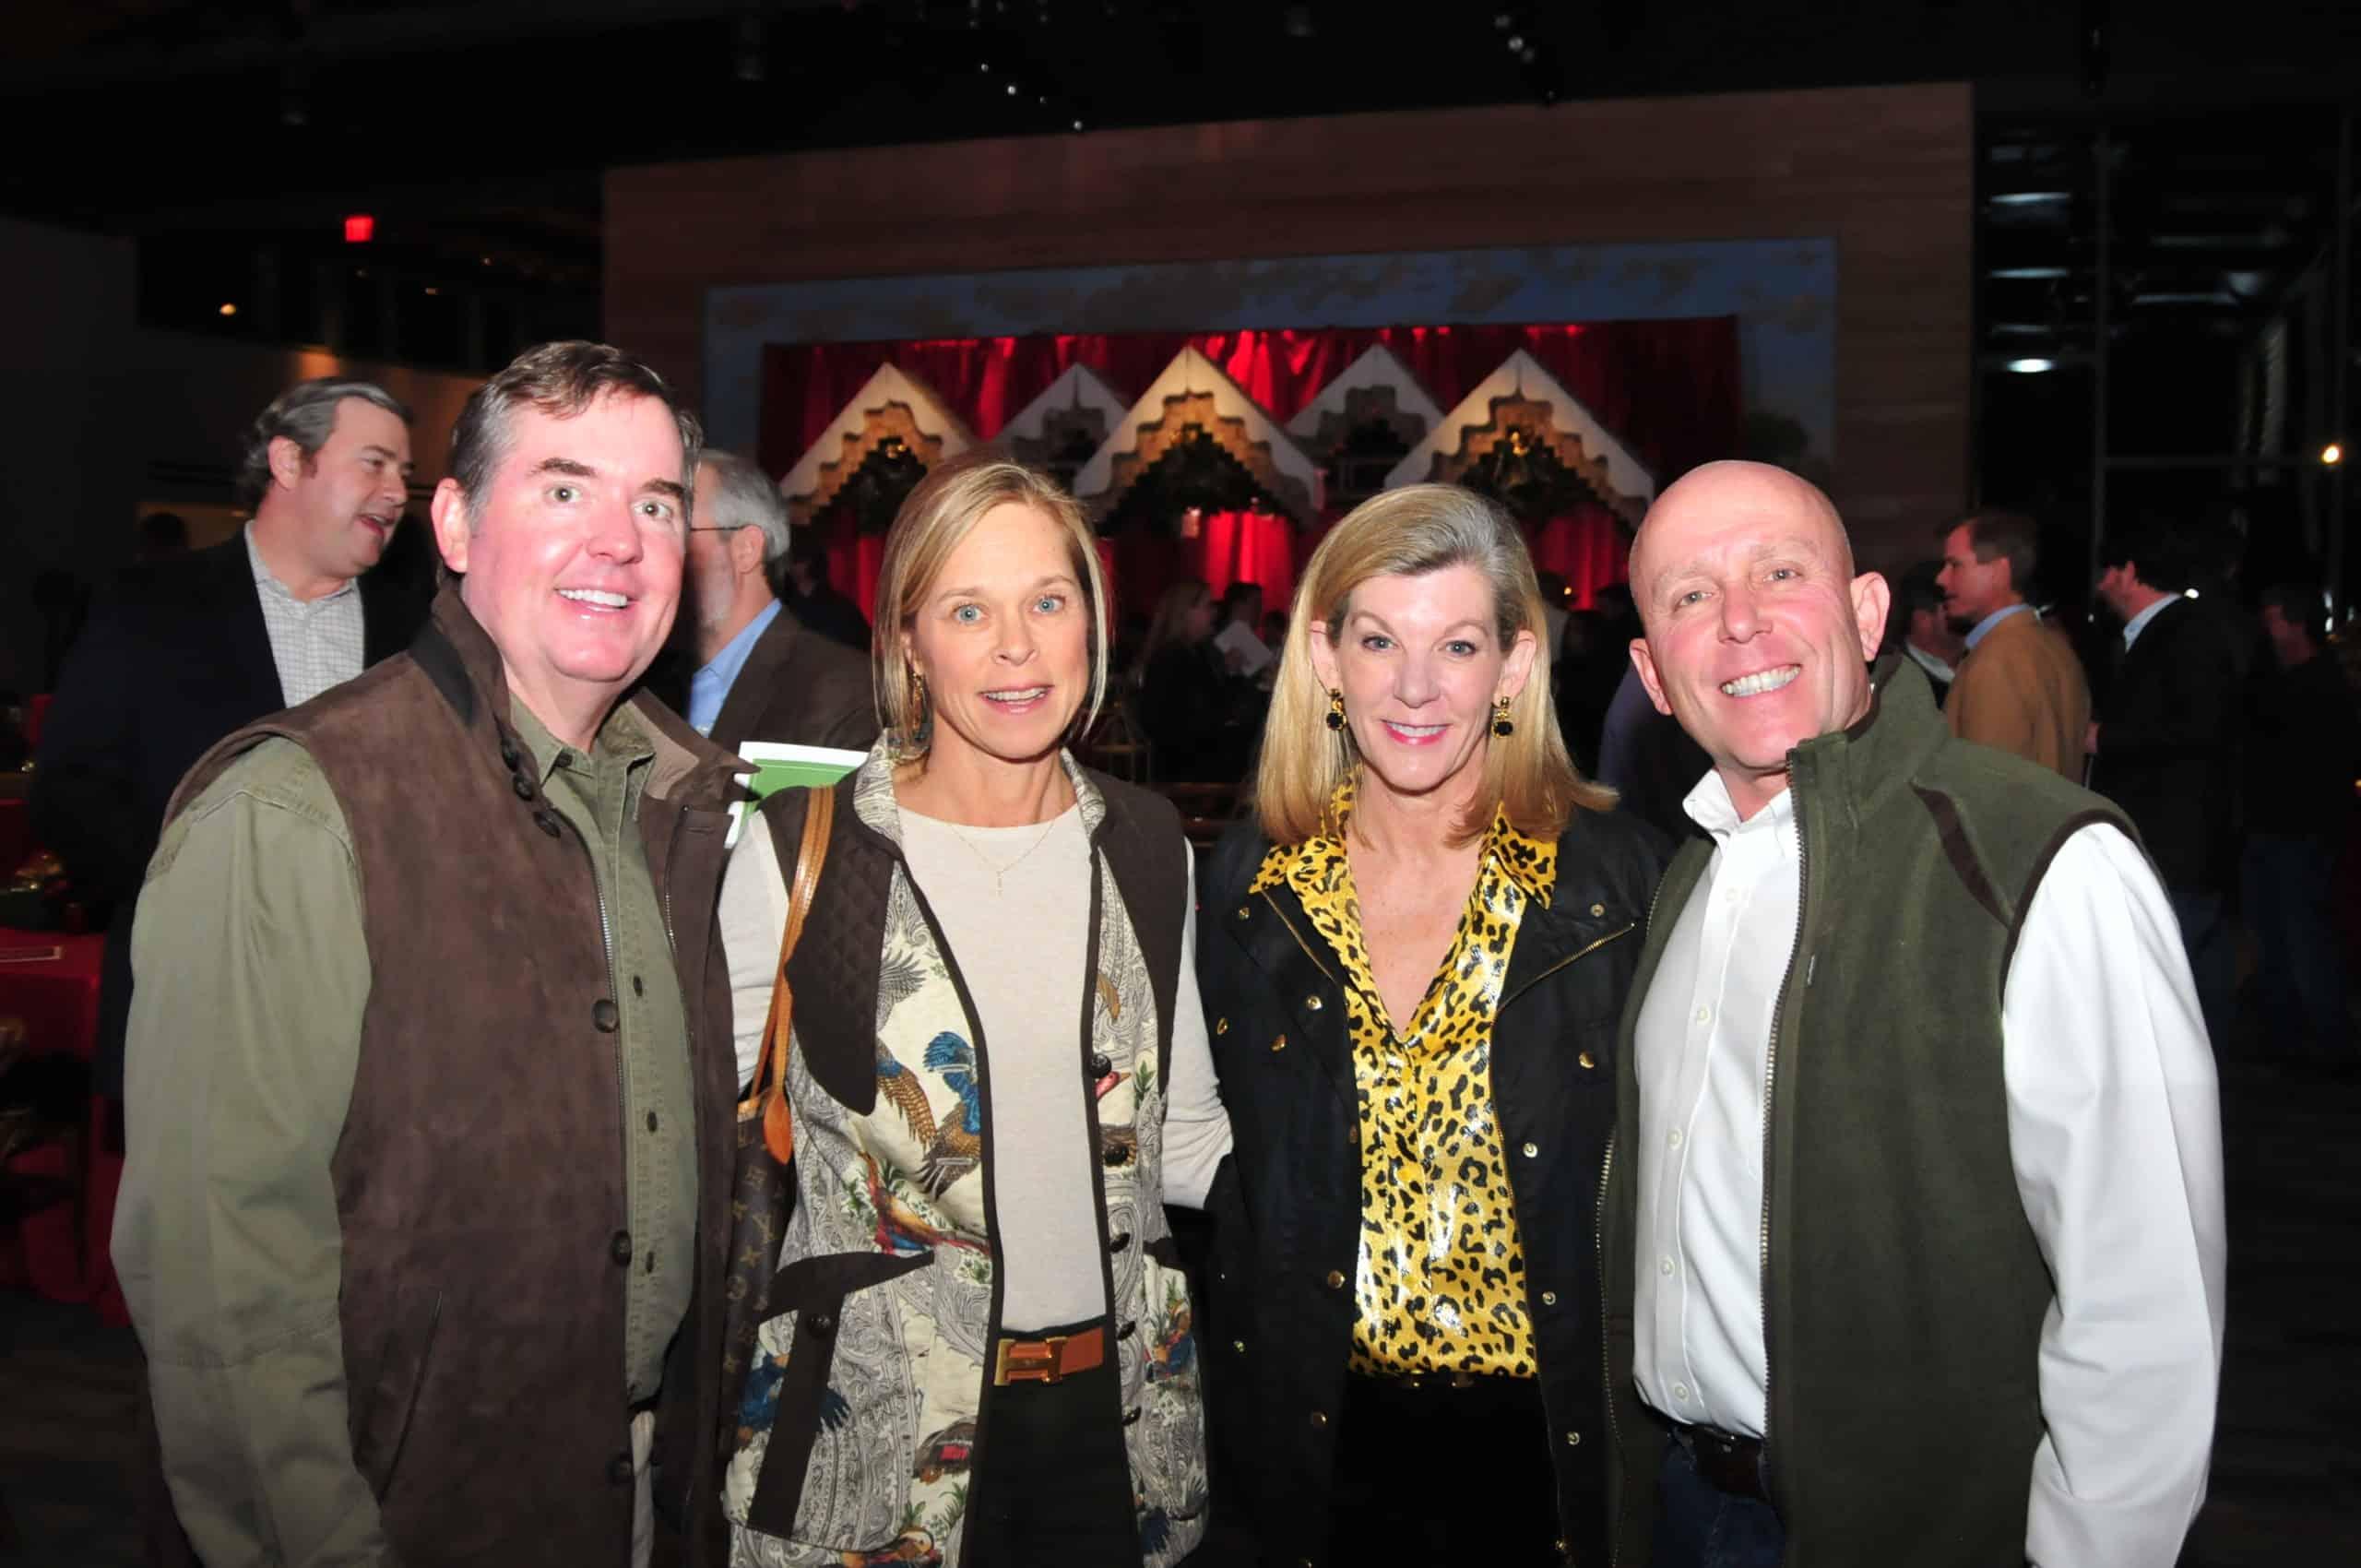 Larry Cochran, Doreen Magoon, Jody Cochran and Dr. Mike Magoon